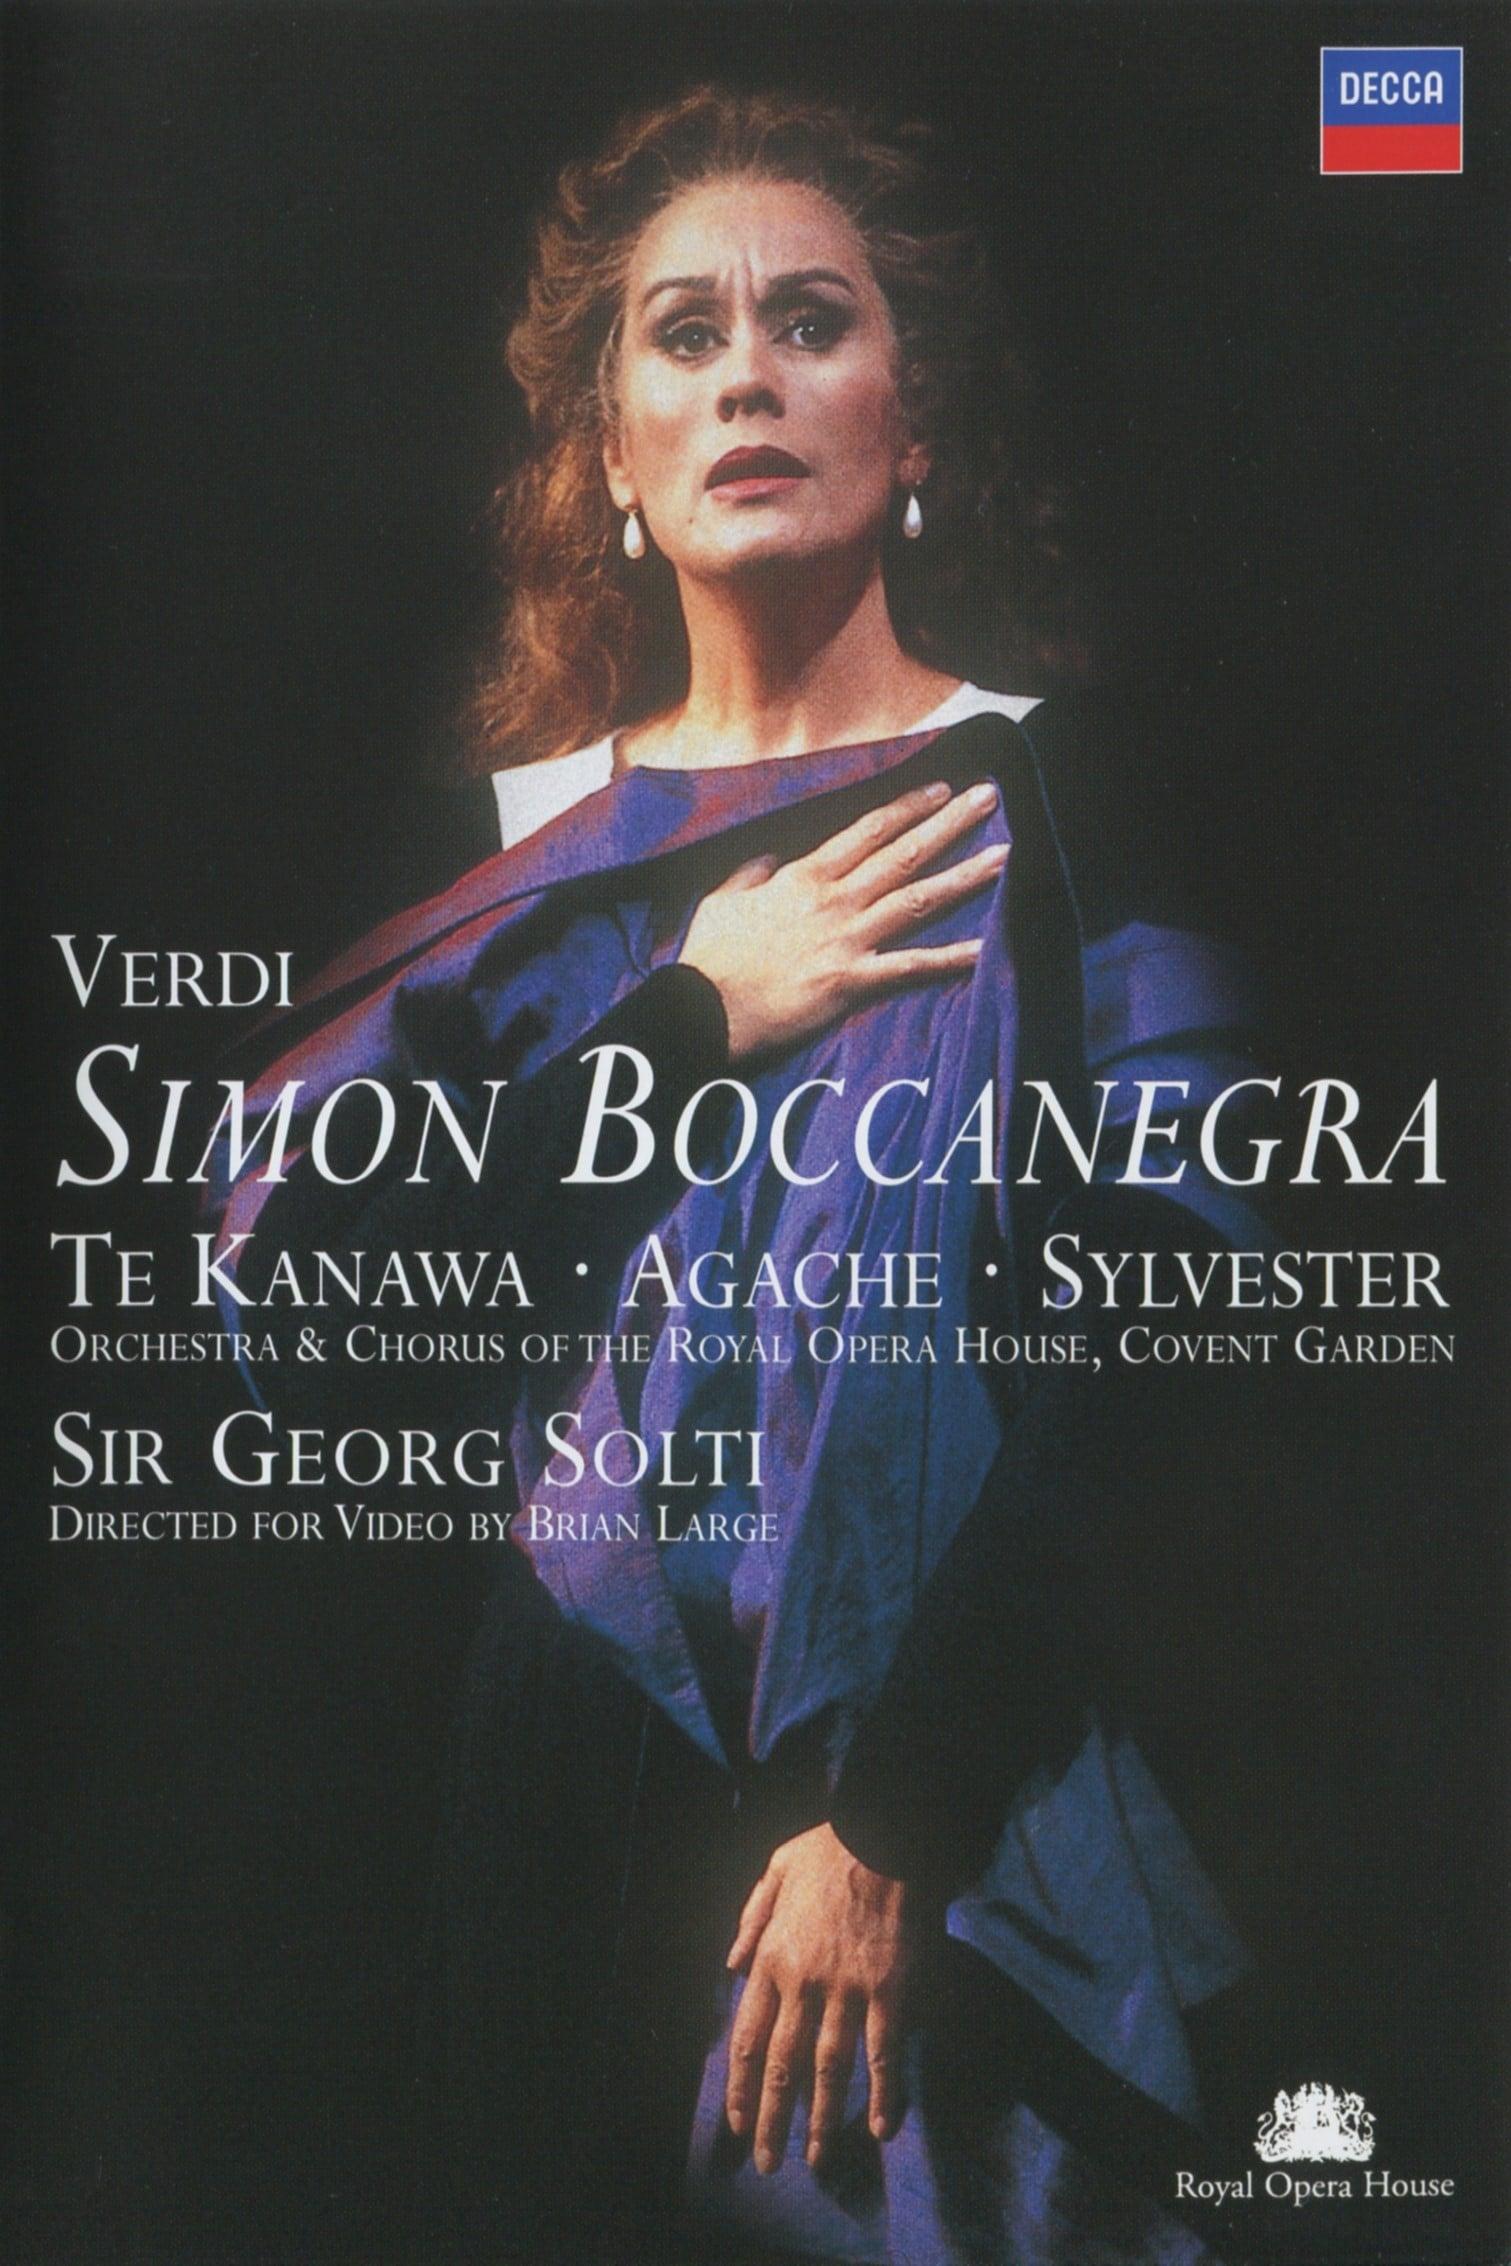 Simon Boccanegra: Royal Opera House